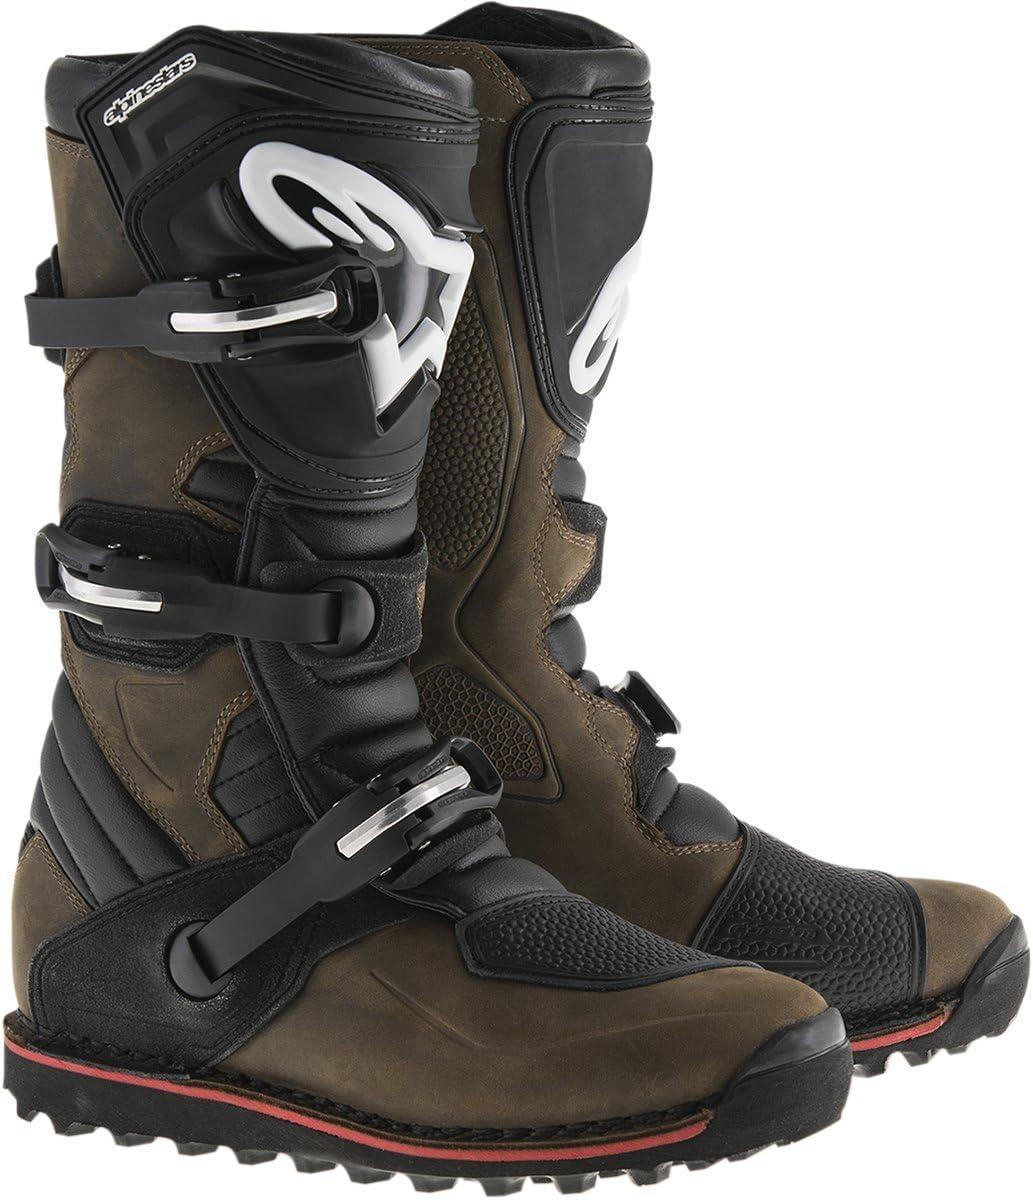 Alpinestars Mens Tech T Boots Black//Red, Size 9